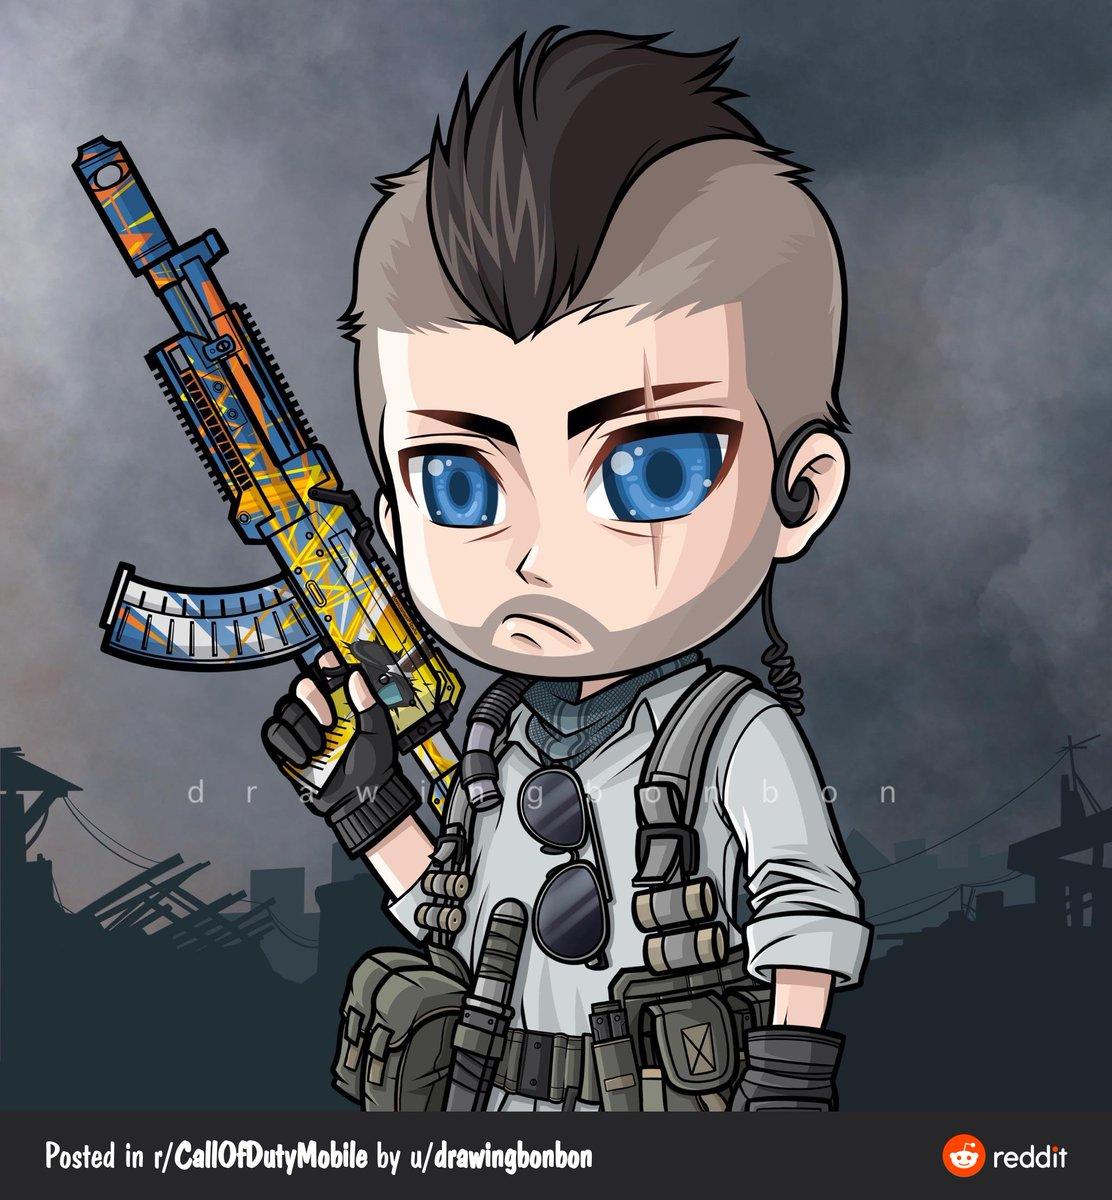 Call Of Duty Mobile On Twitter John Mactavish Soap Fan Art By Reddit User U Drawingbonbon